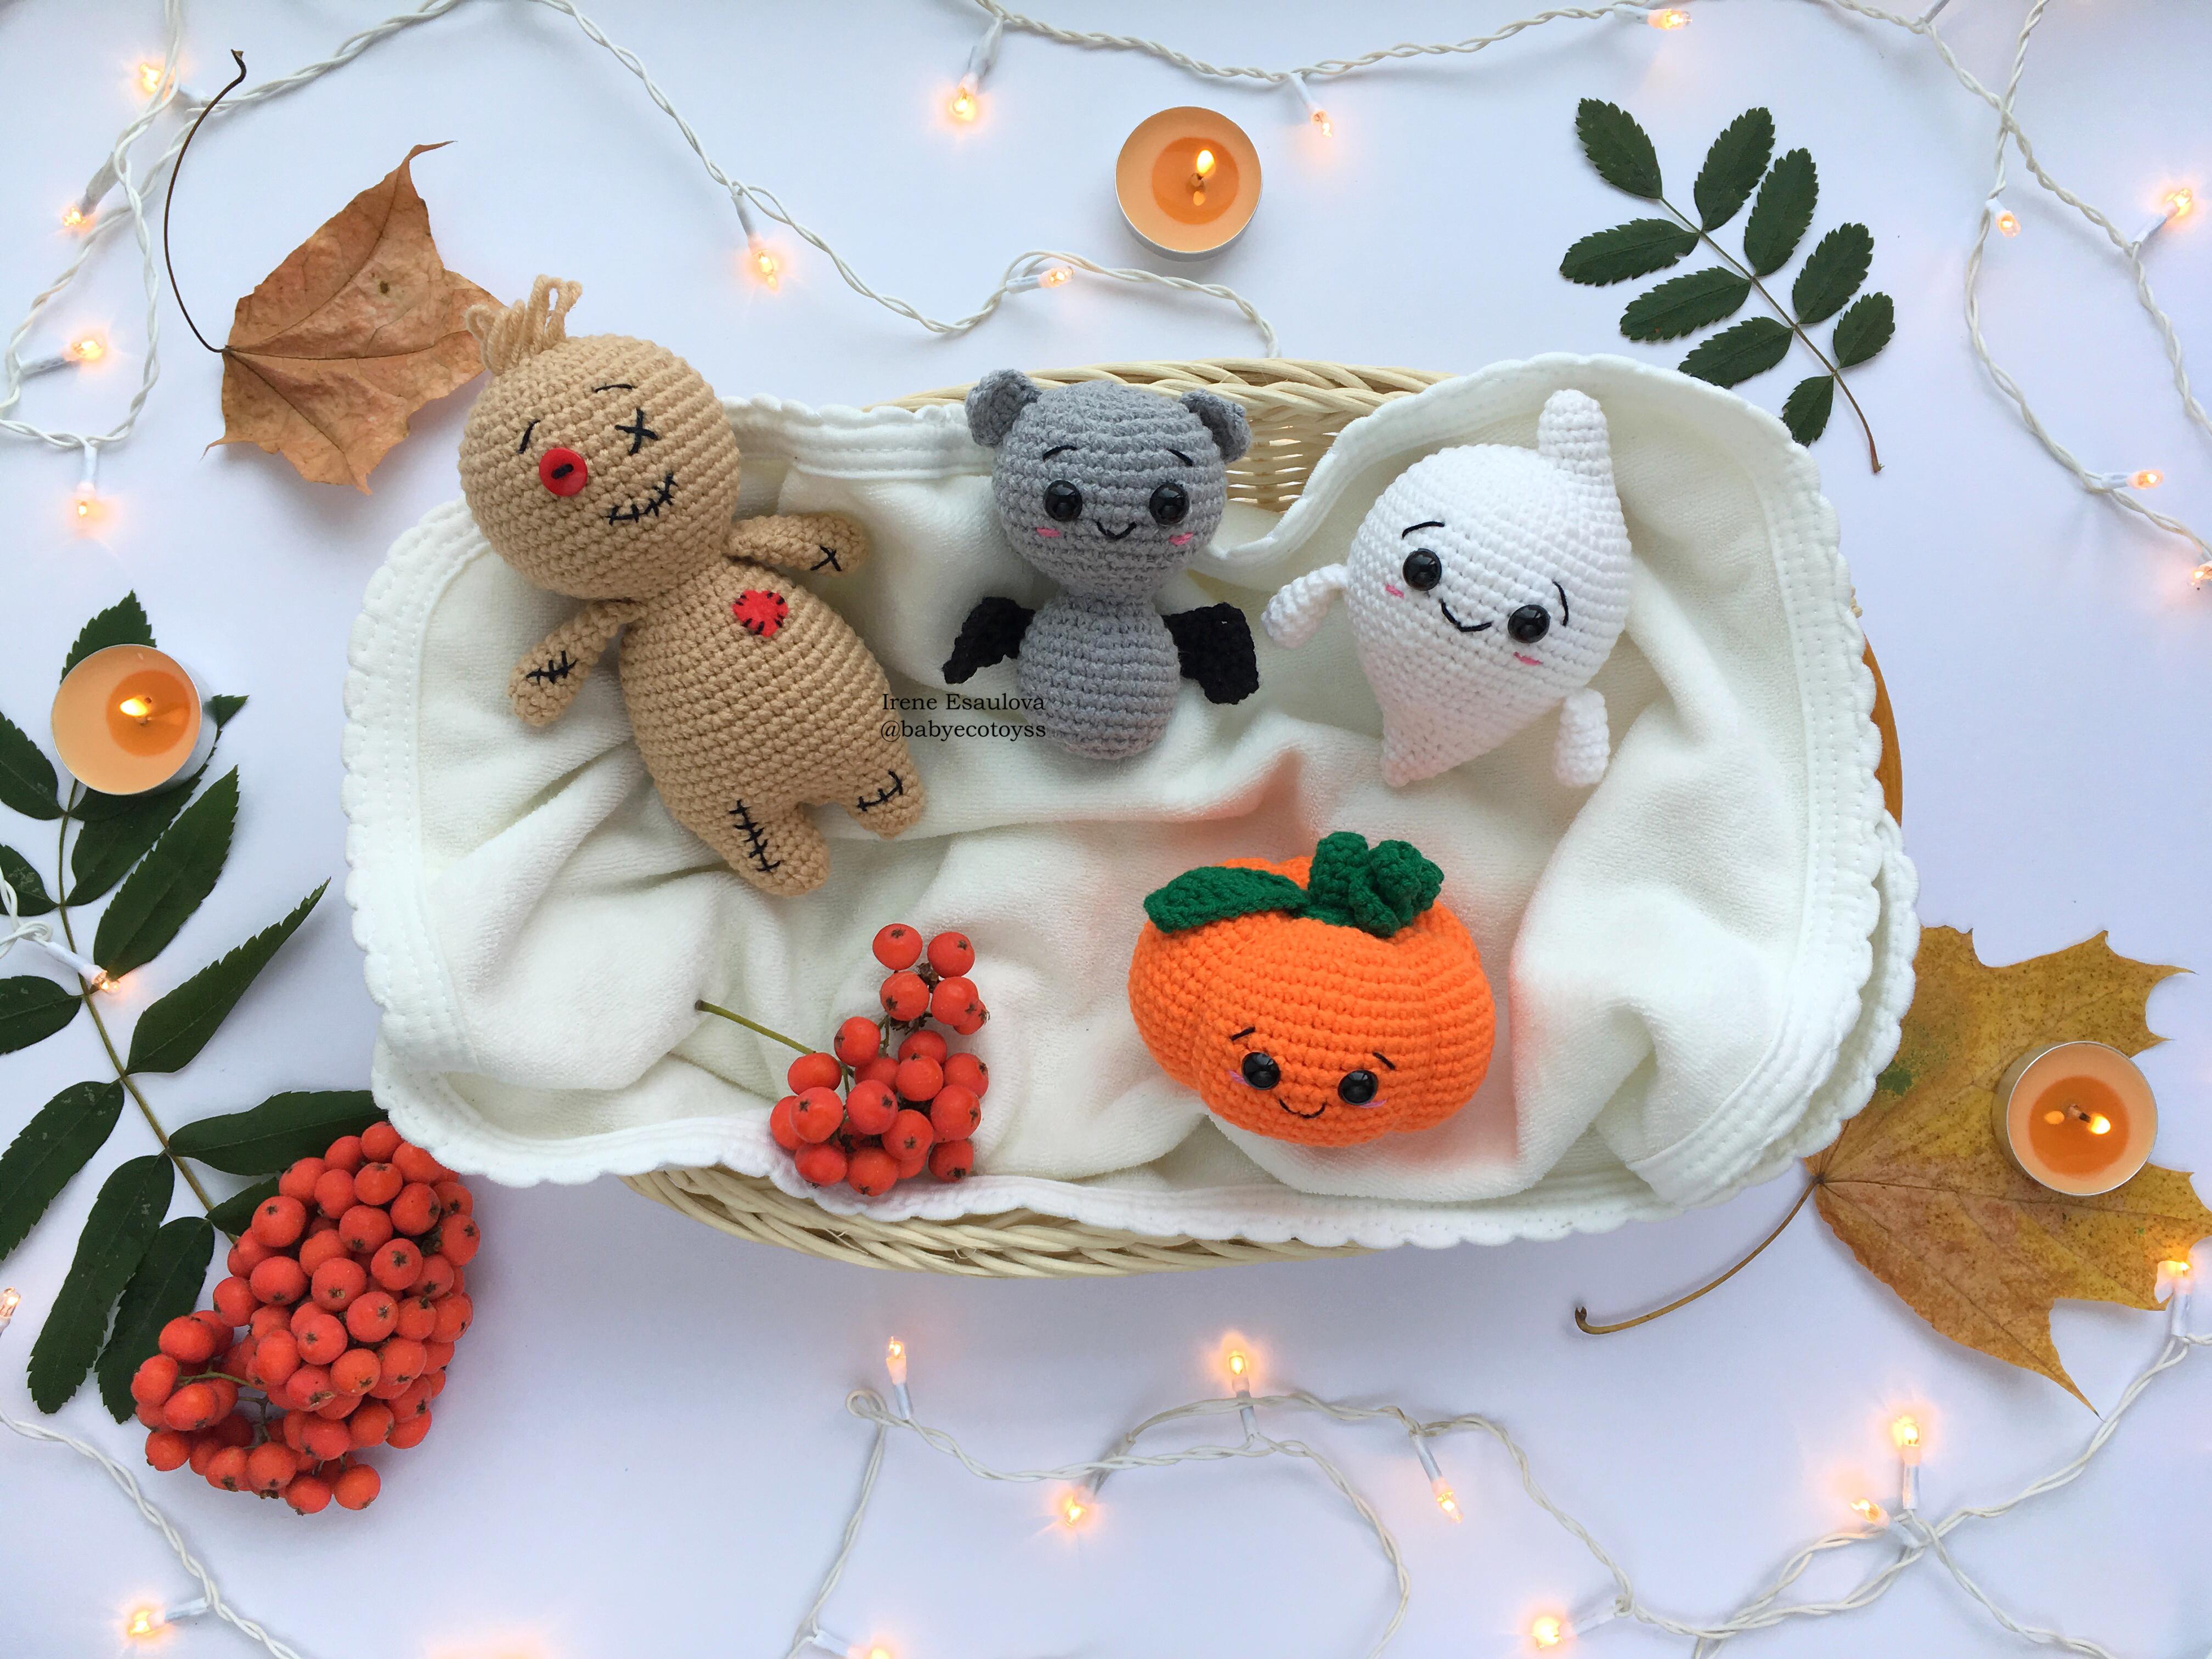 Amigurumi Dolls Voodoo Pattern What A Cute Couple - Crochet News   3024x4032